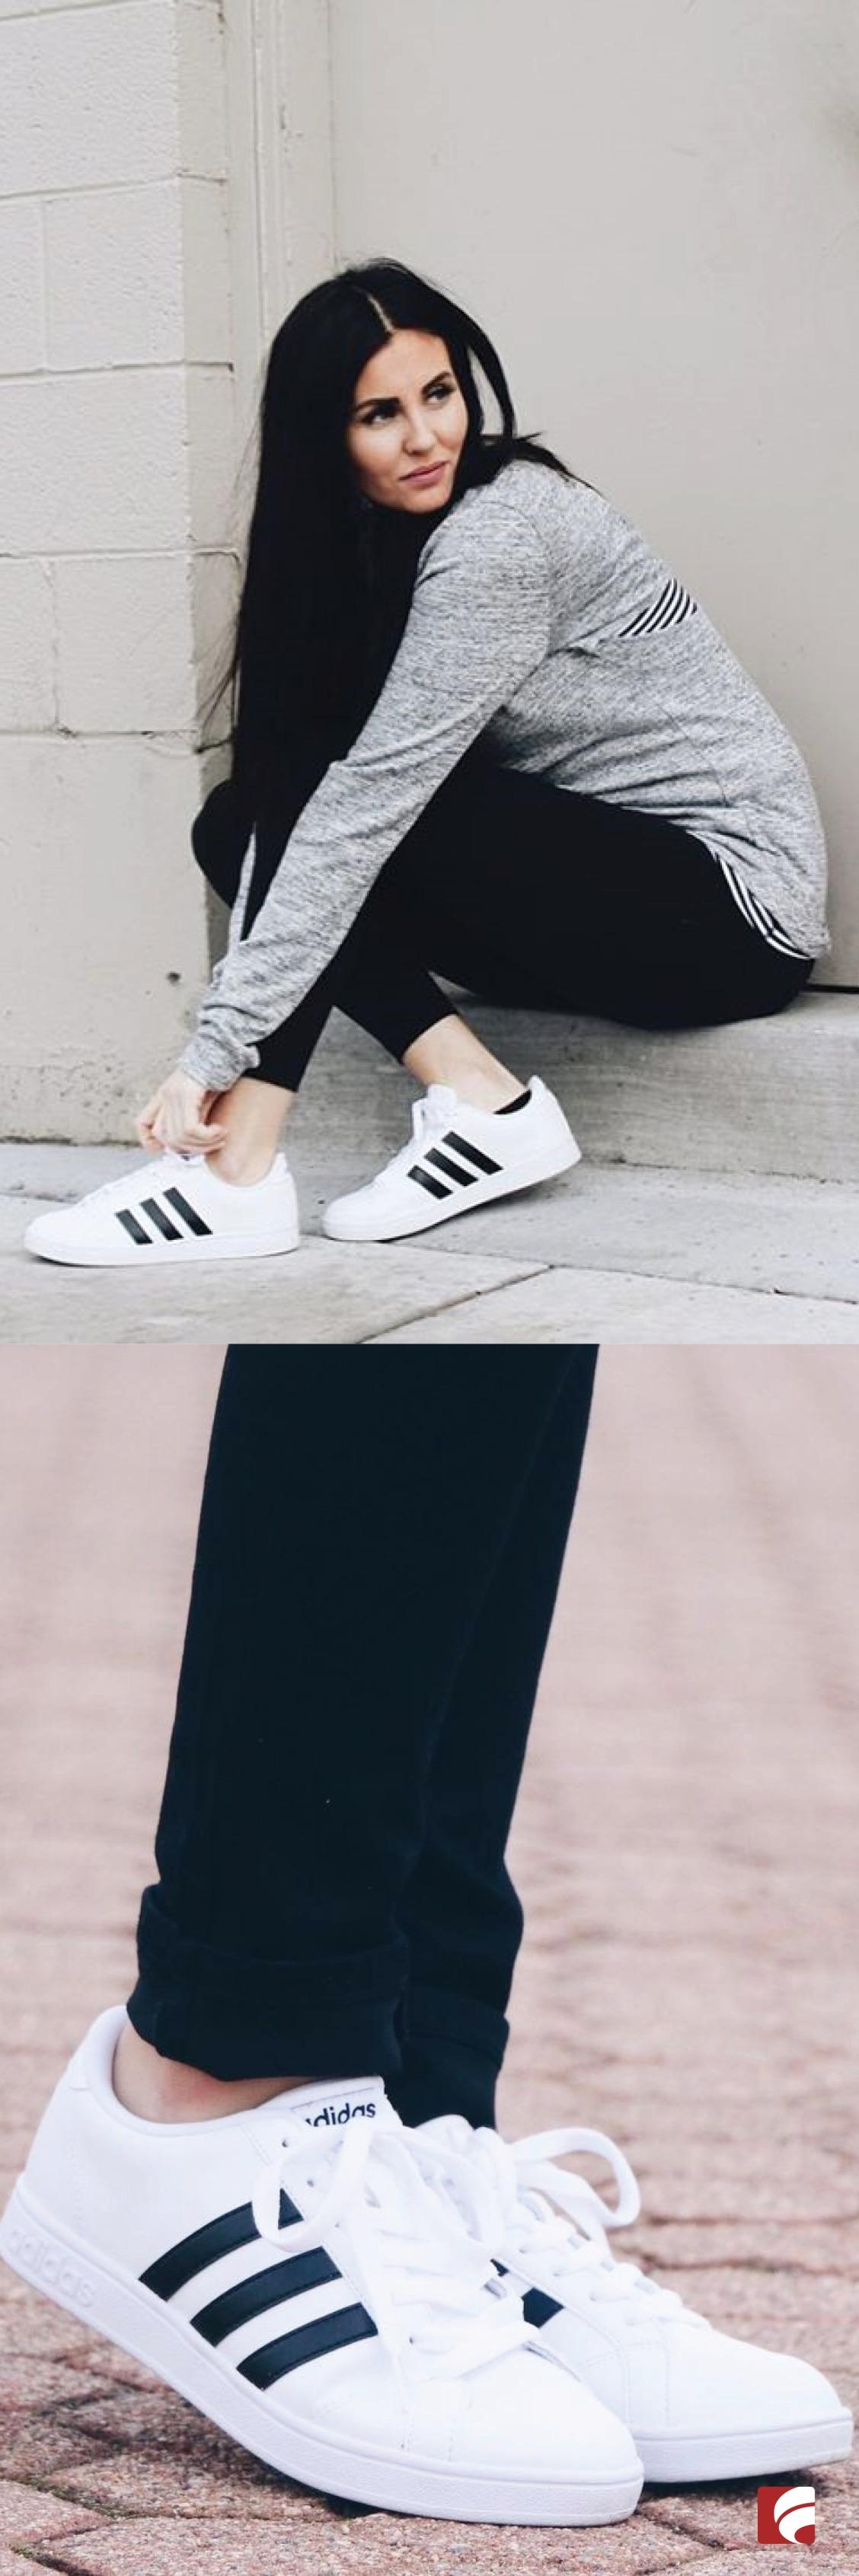 sneakers femme adidas baseline